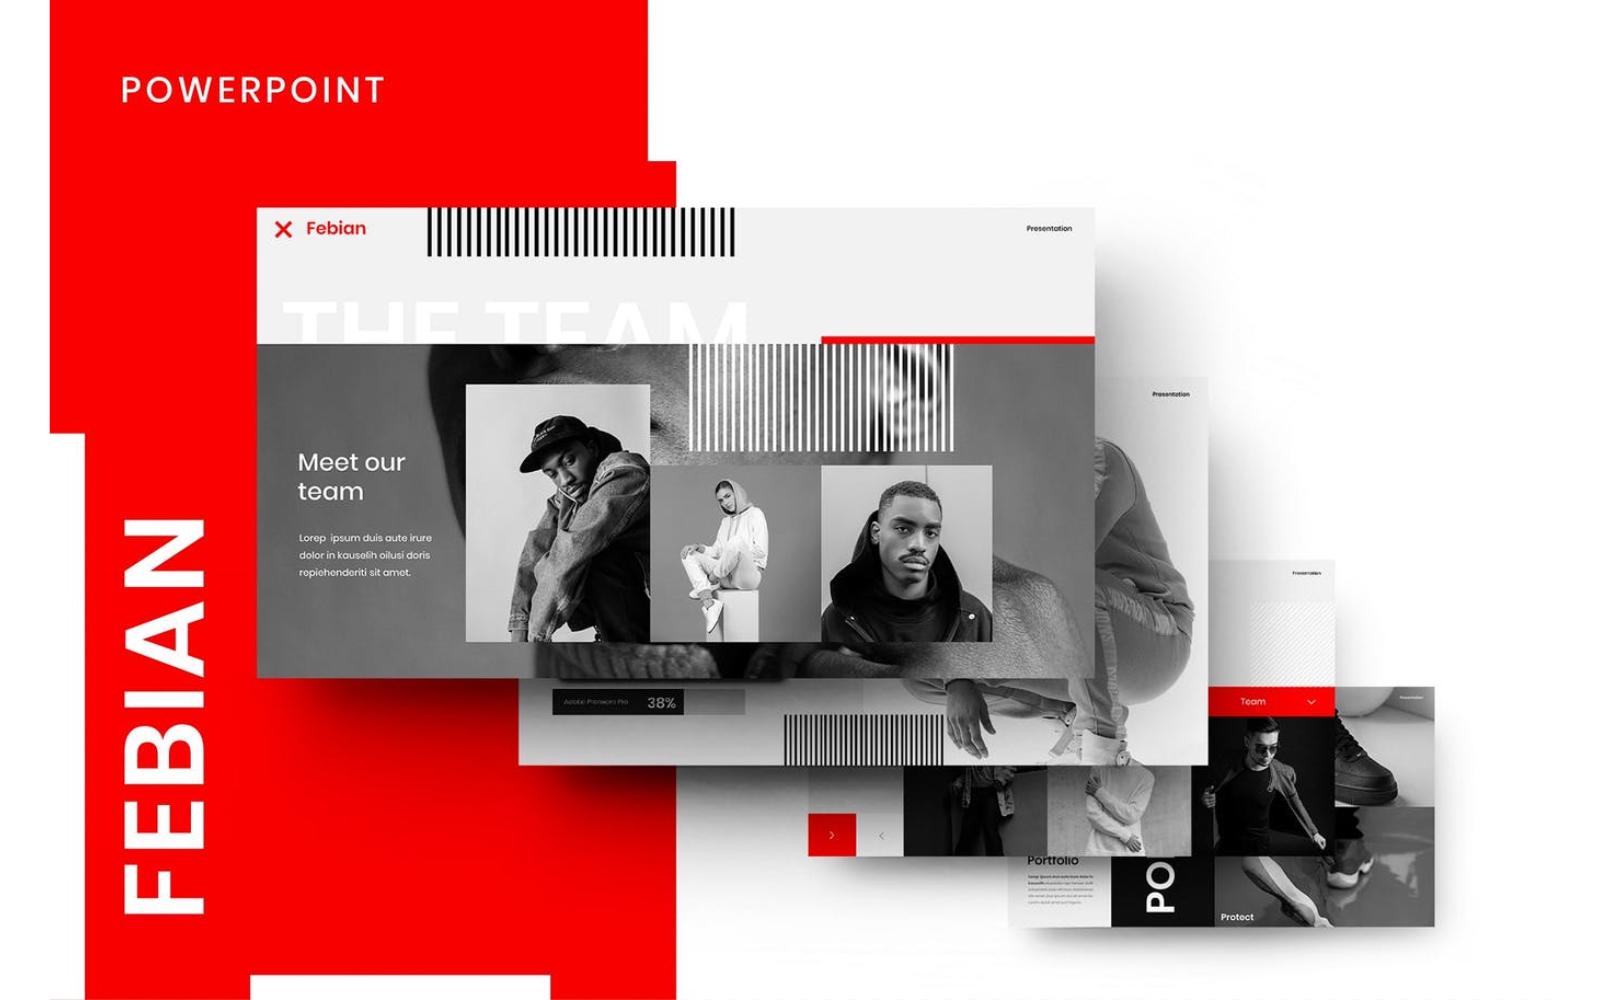 Febian – Business PowerPoint Template